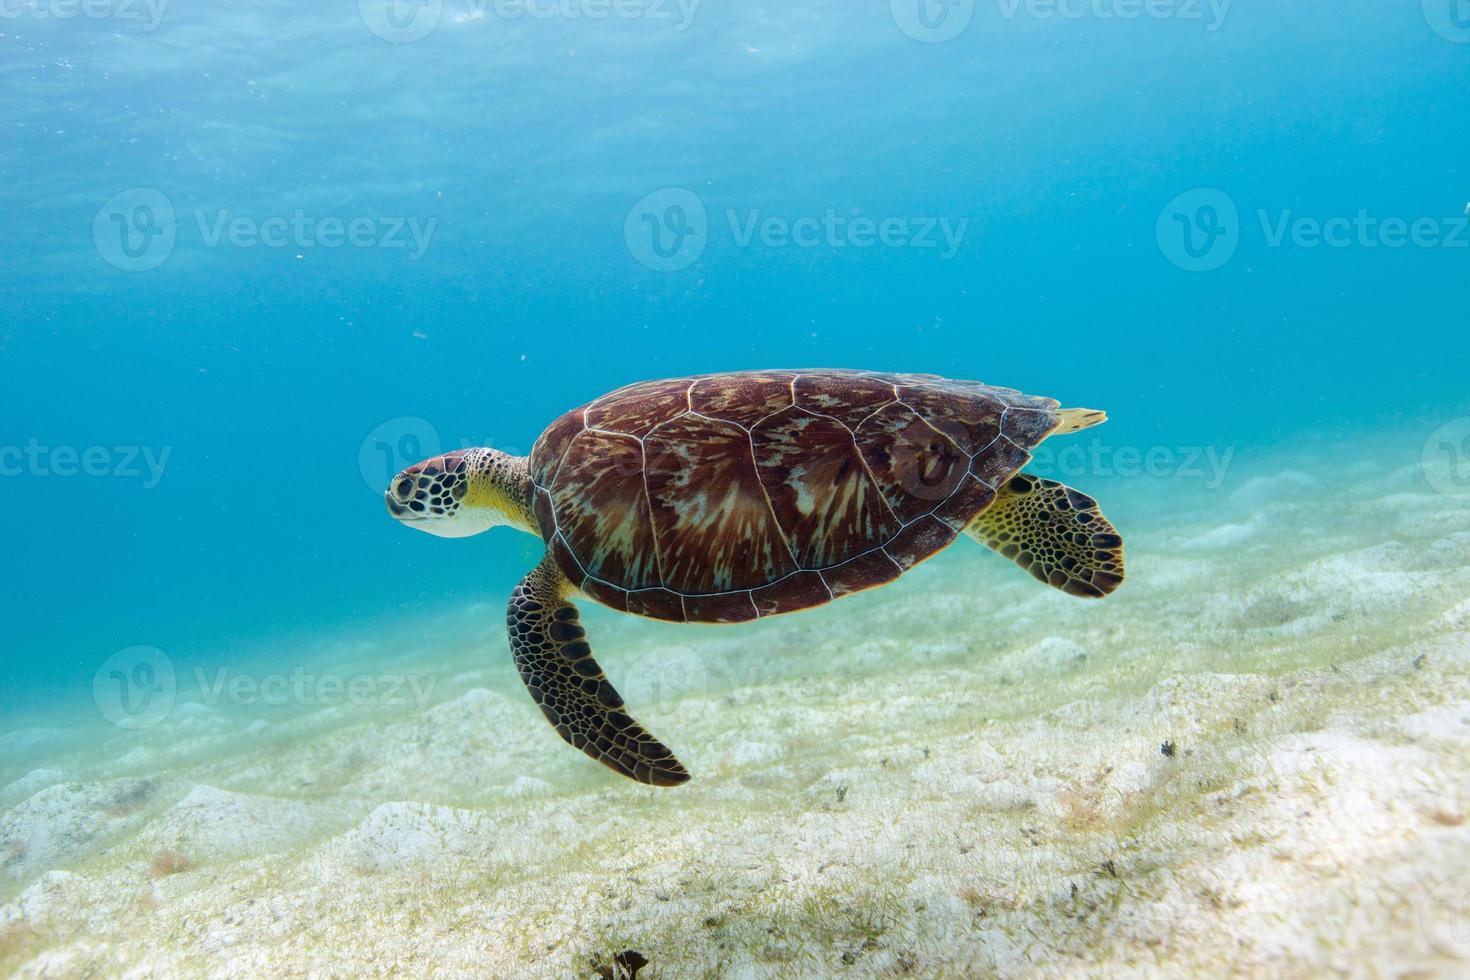 karetschildpad zeeschildpad foto